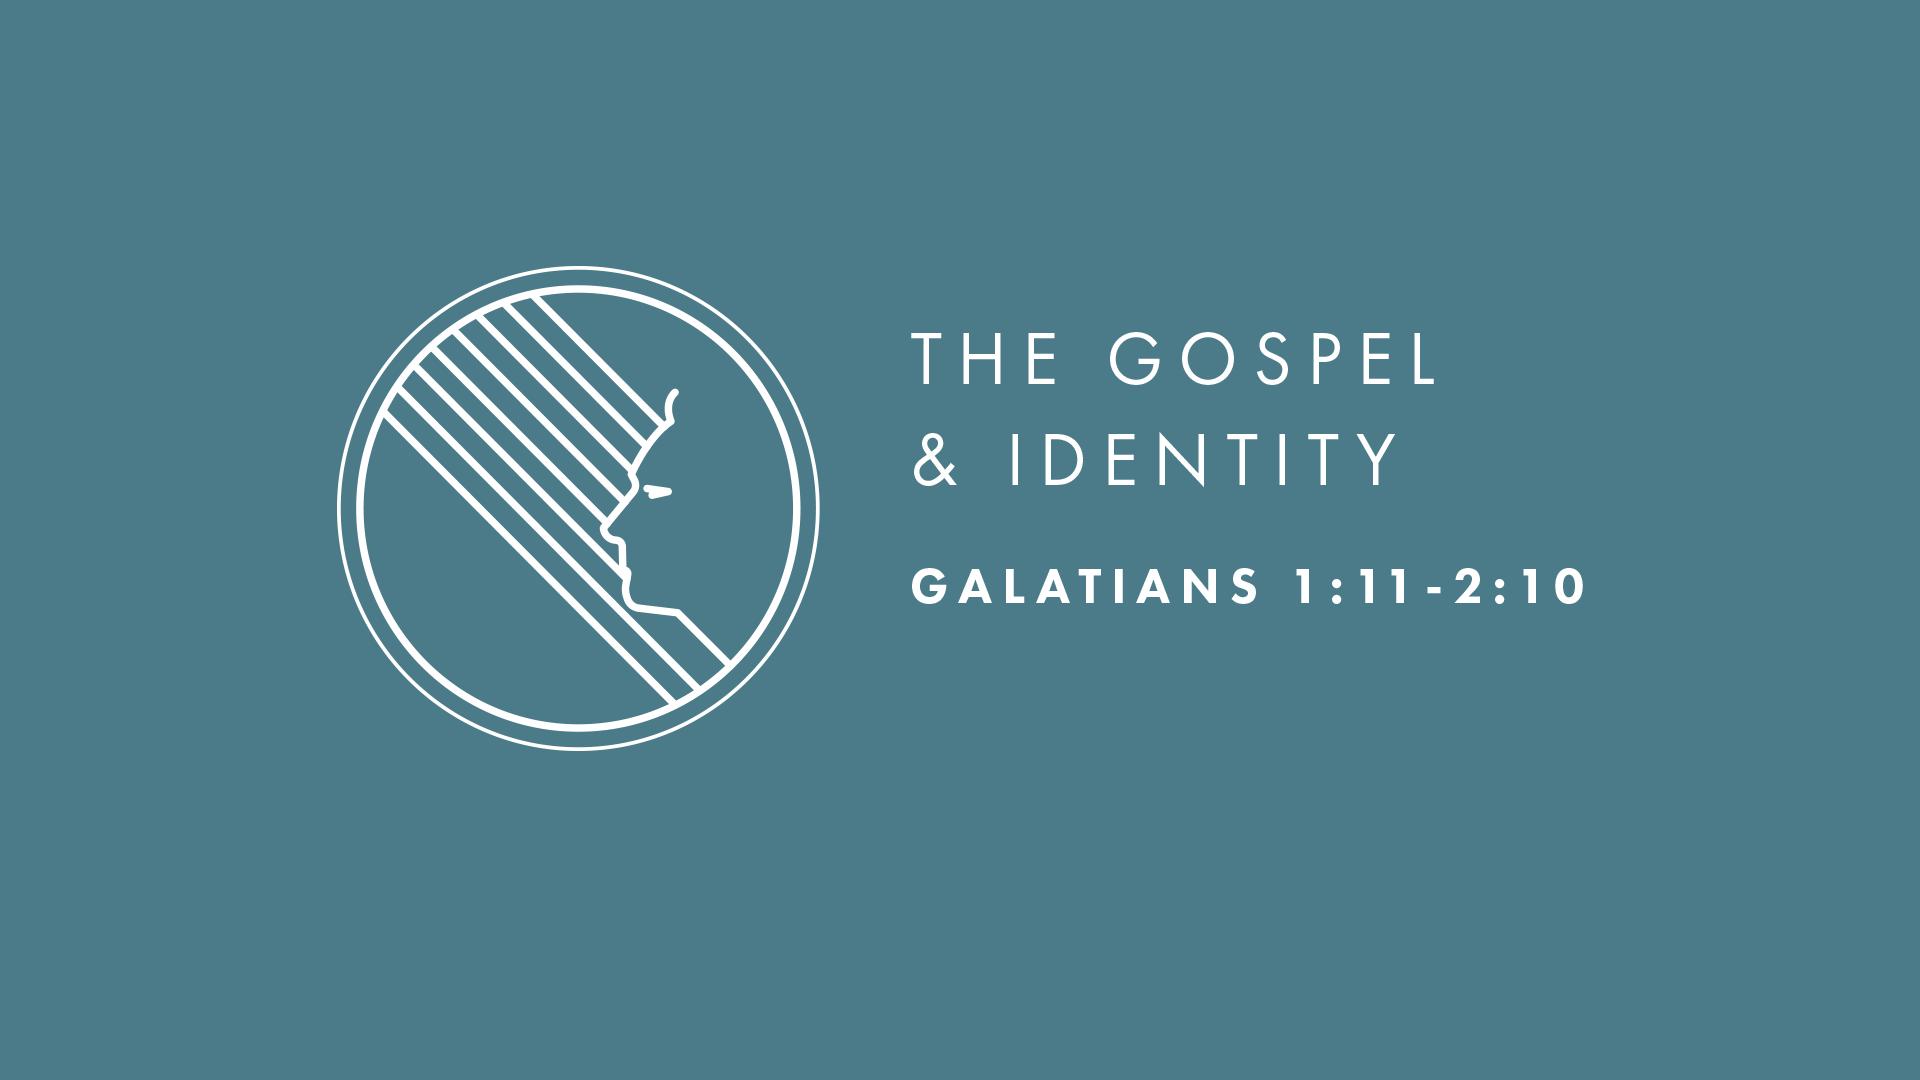 The Gospel and Identity